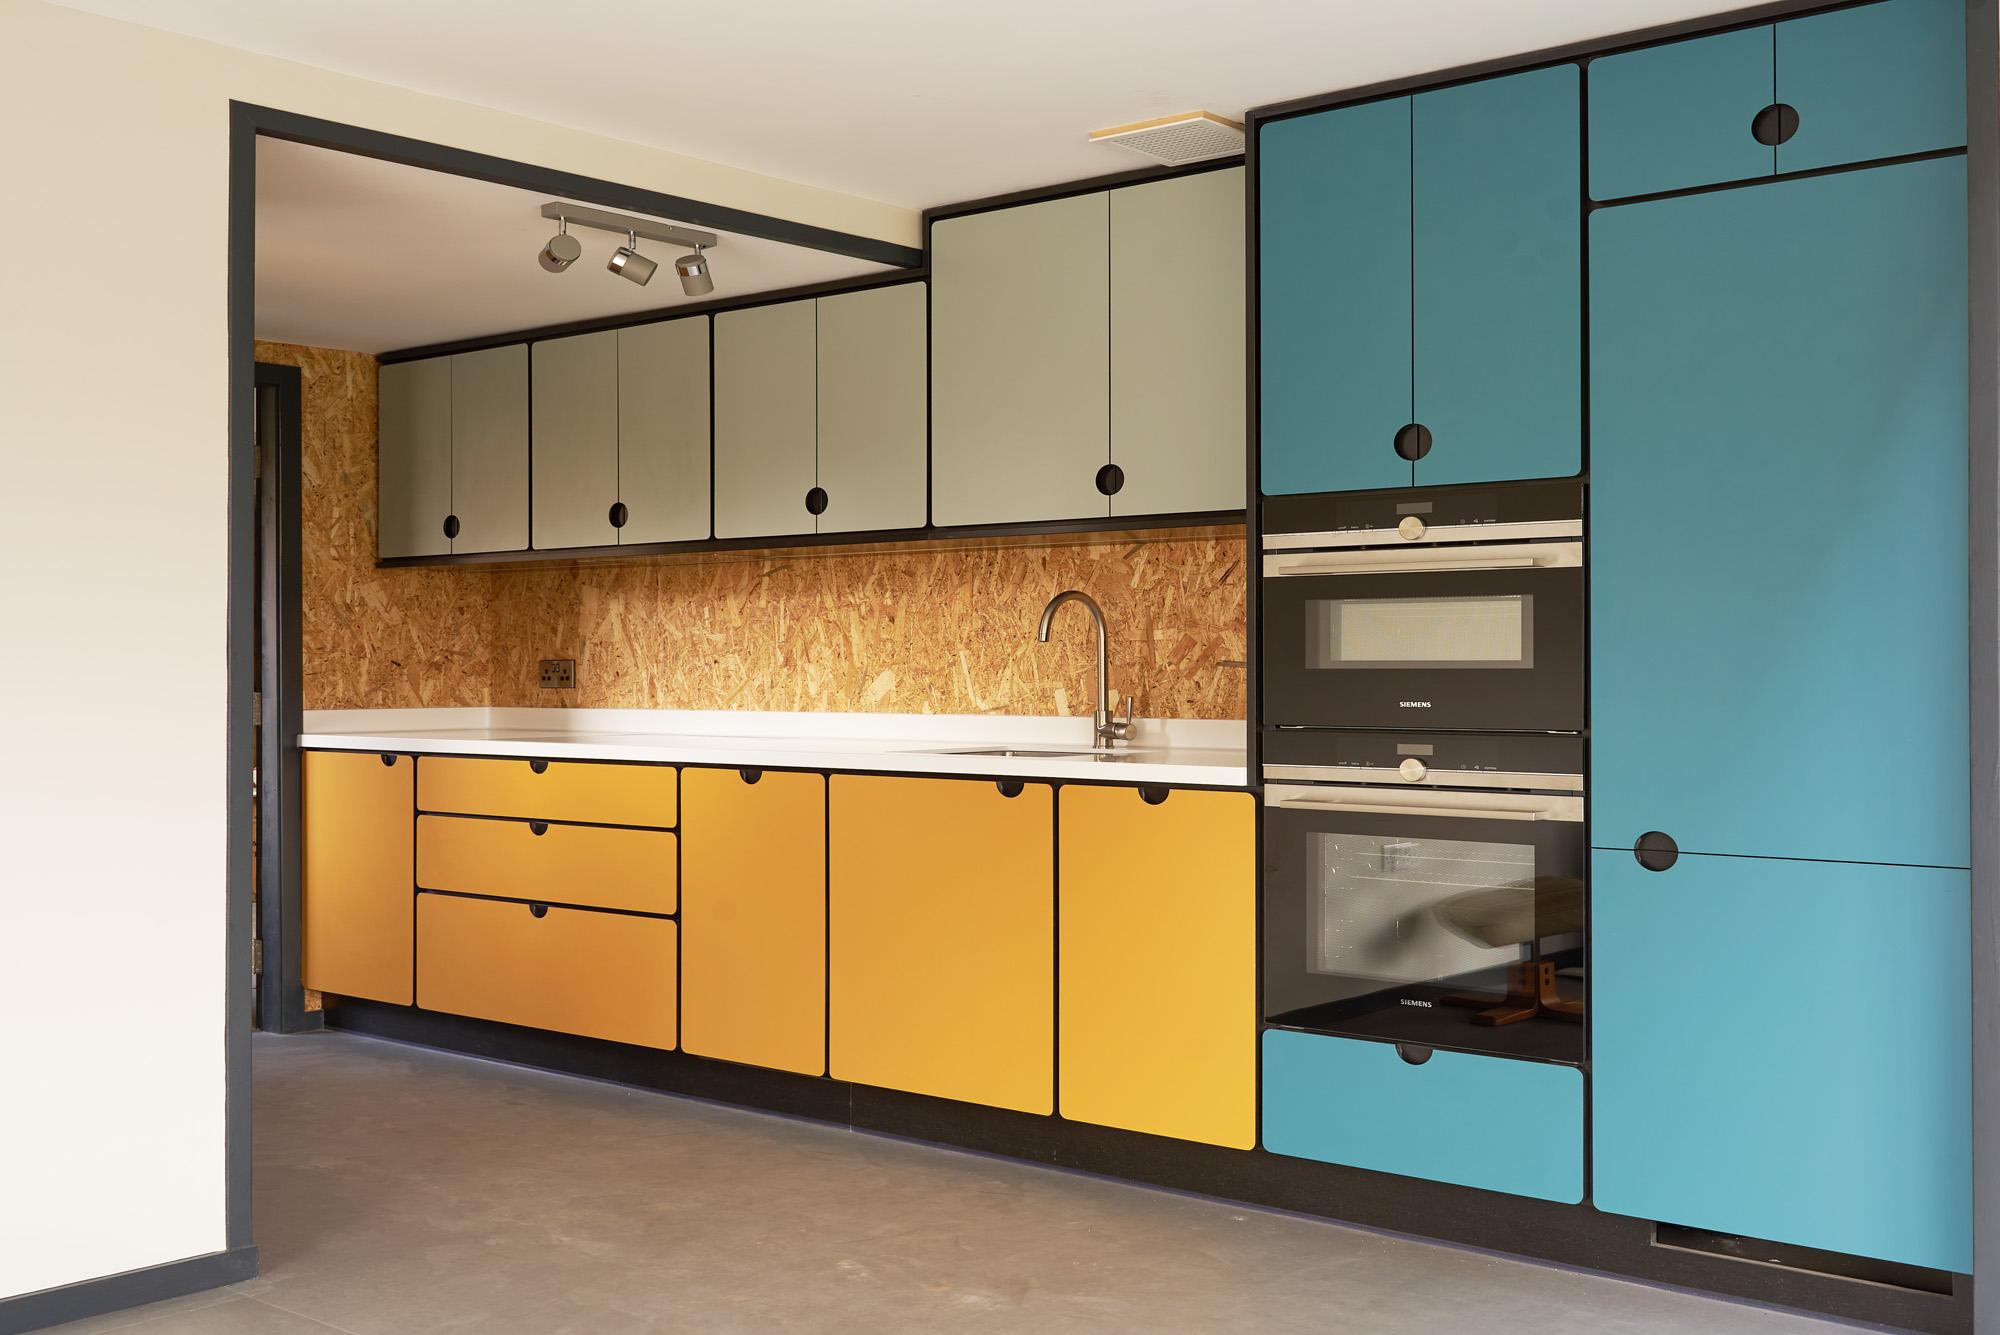 valchromat kitchen yellow